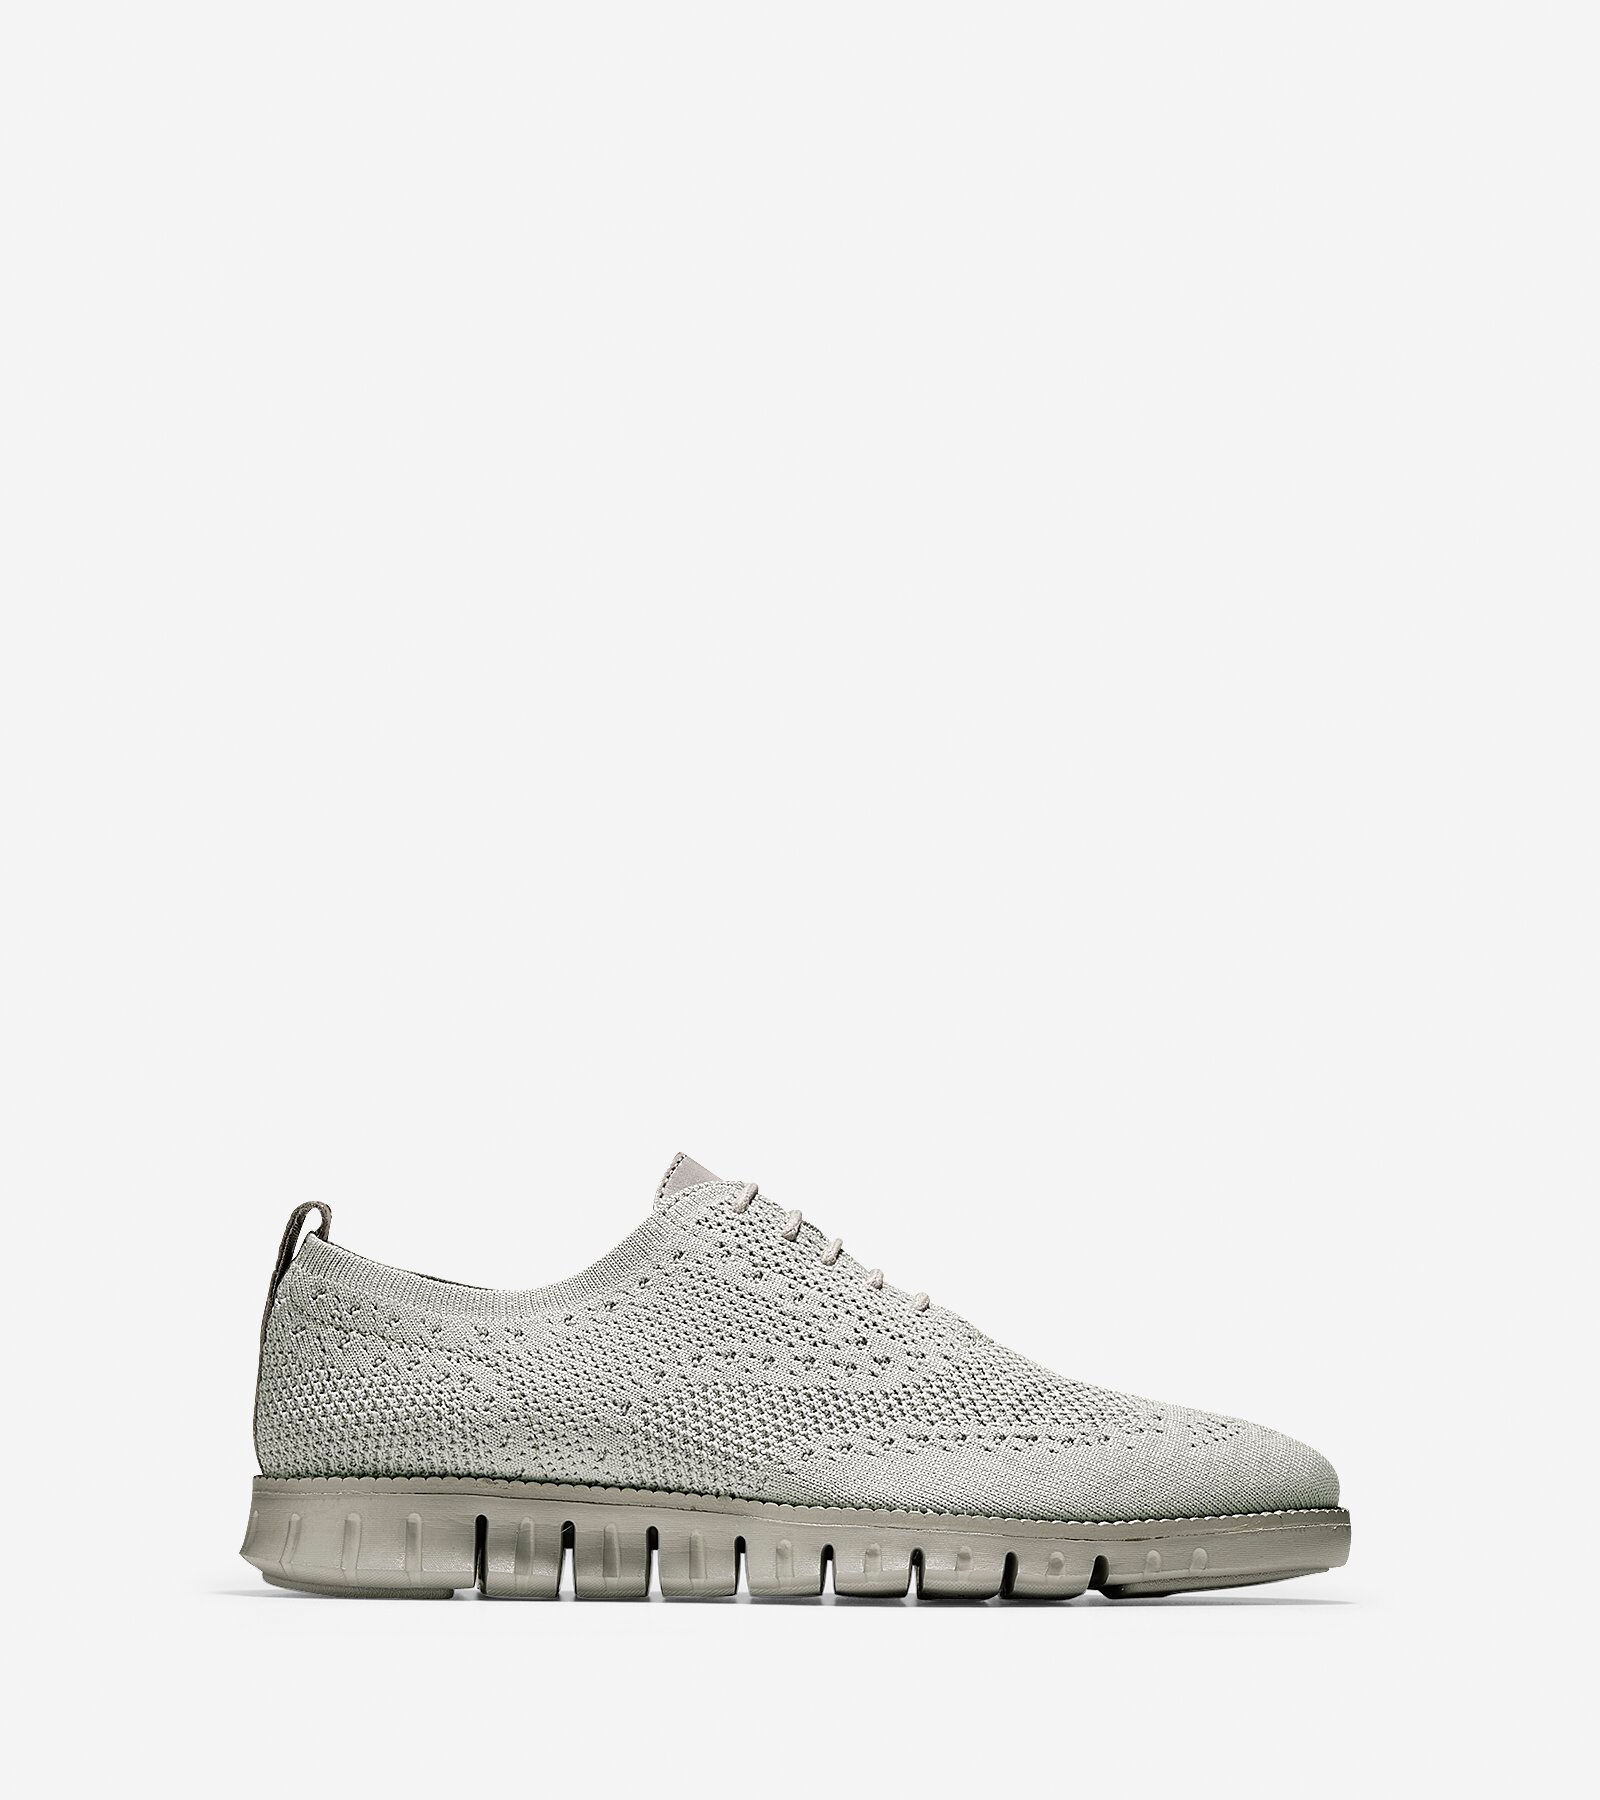 Cole Haan Men's Zerogrand Stitchlite Knit Plain Toe Oxfords atgLm